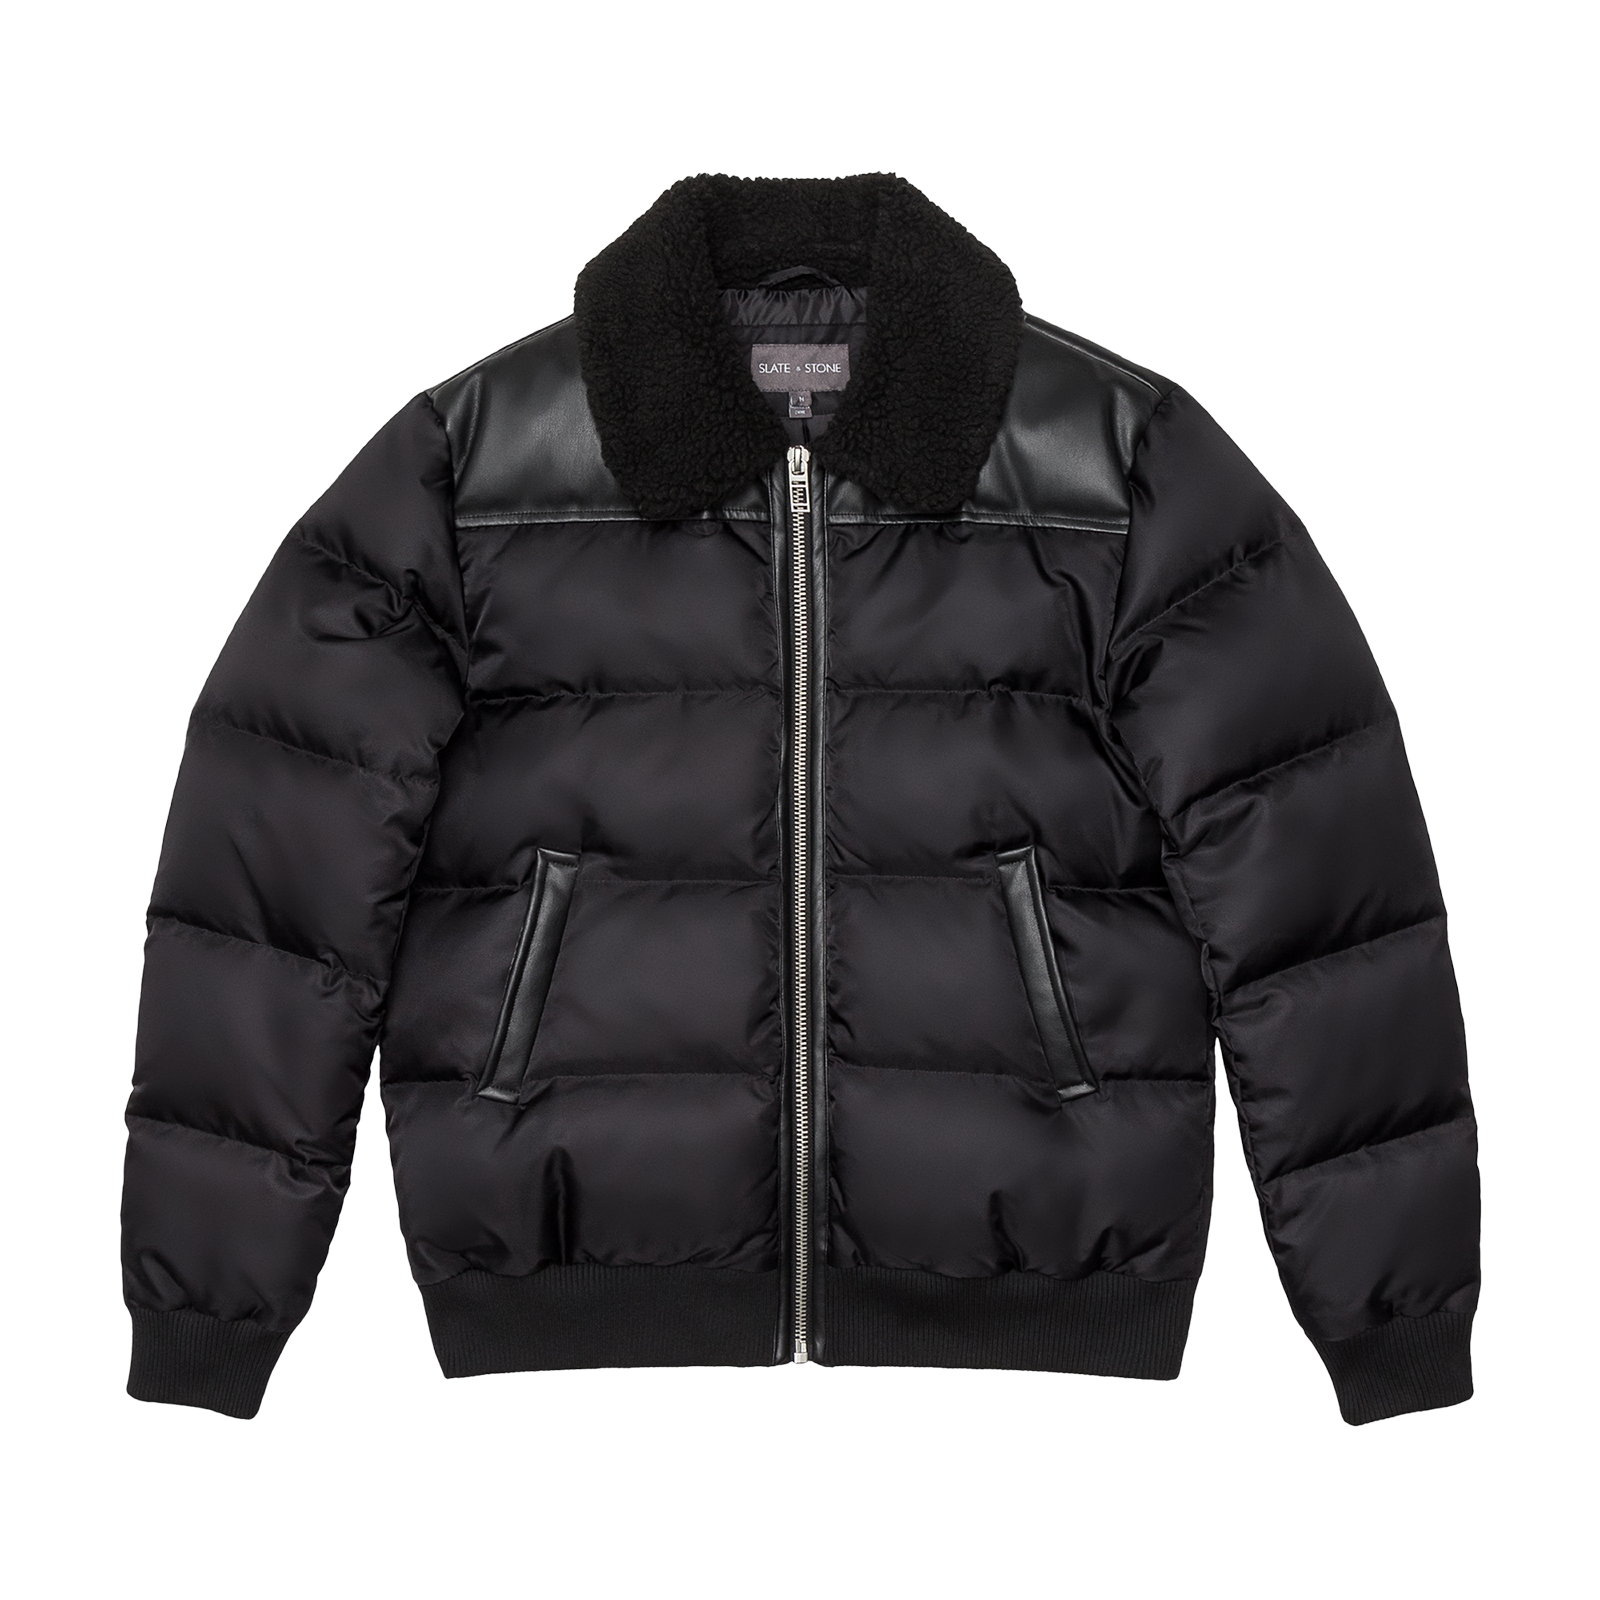 Puffer jacket product photo